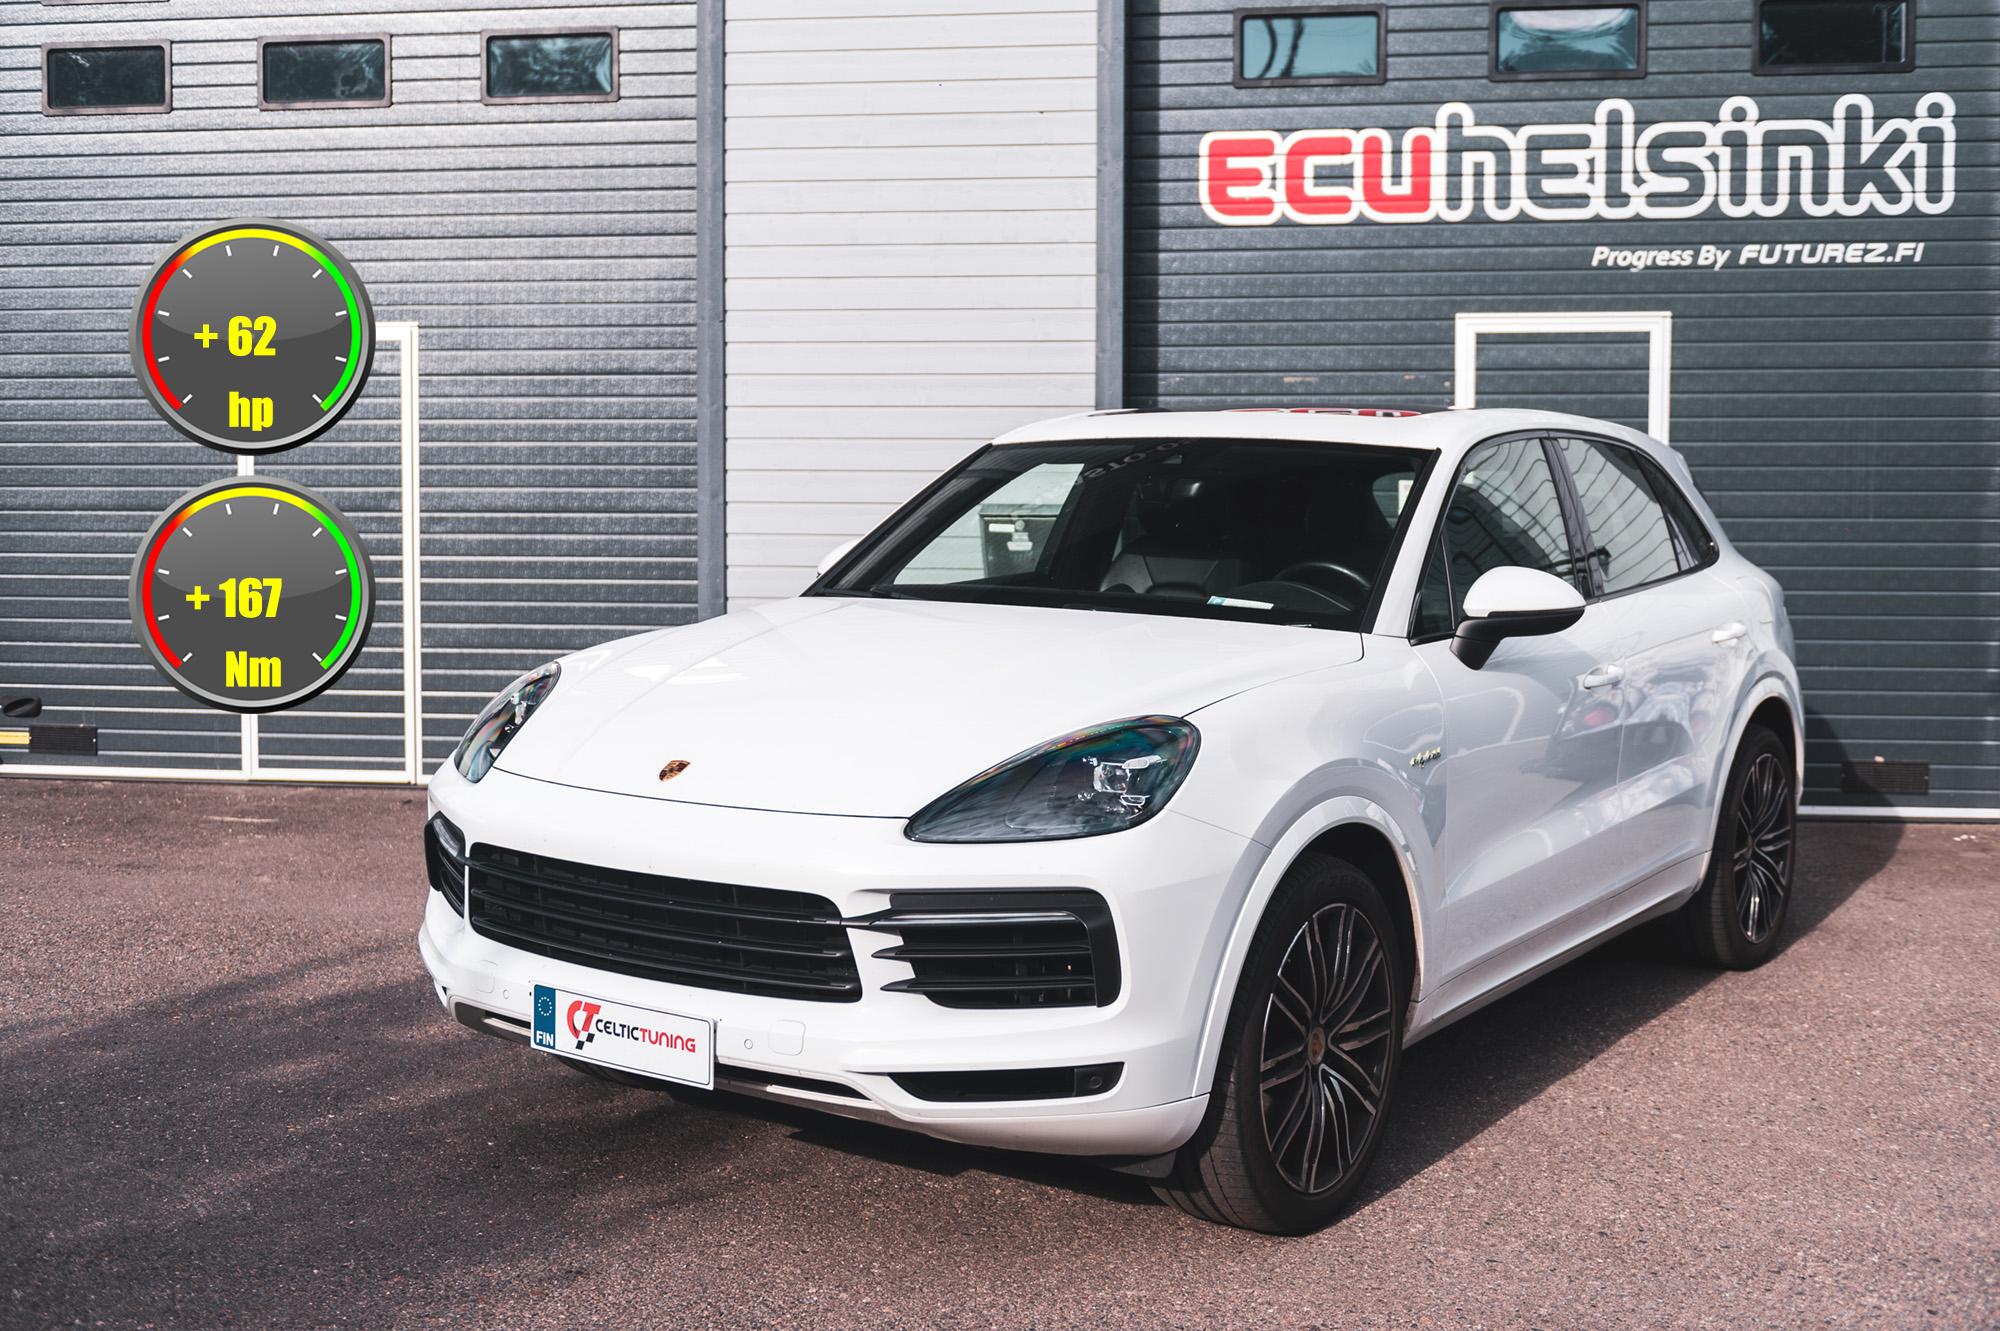 Porsche Cayenne hybrid ohjelmointi celtic tuning